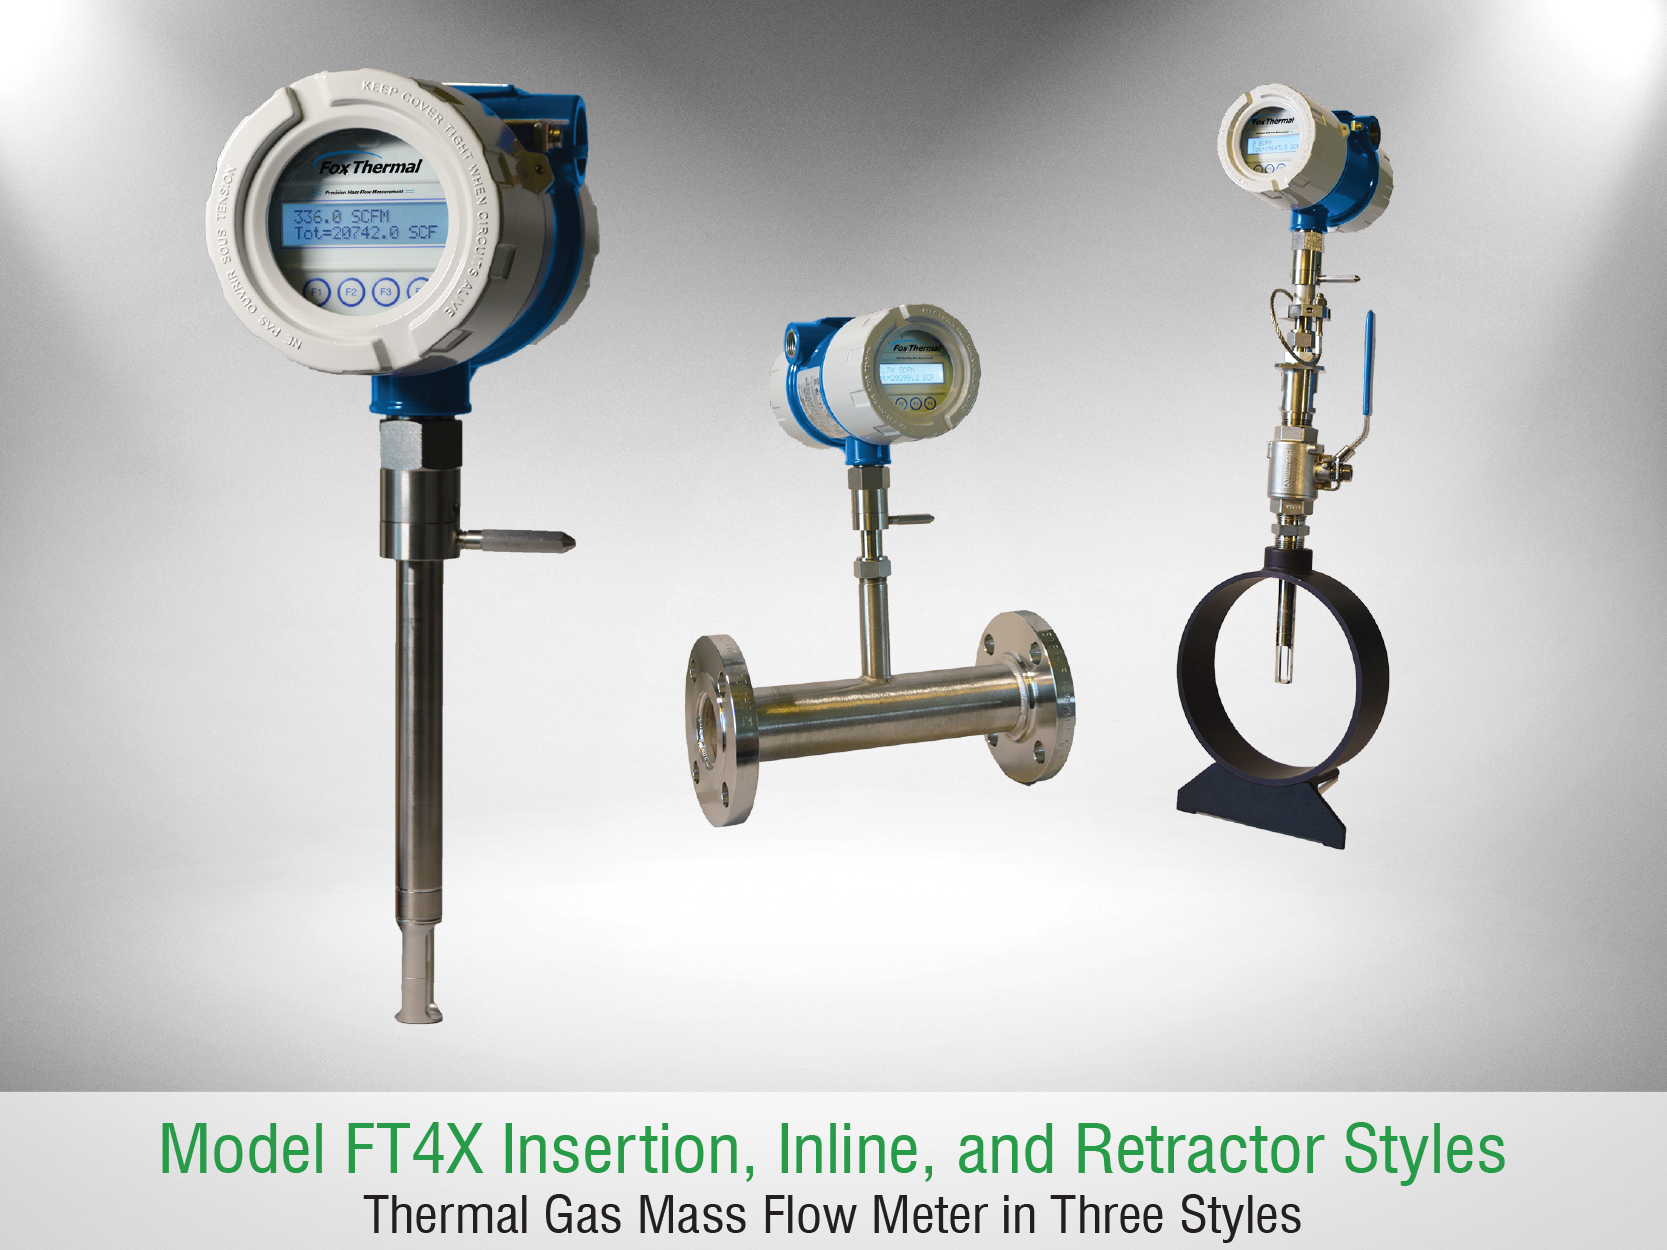 Fox Thermal Model FT4X Flow Meter